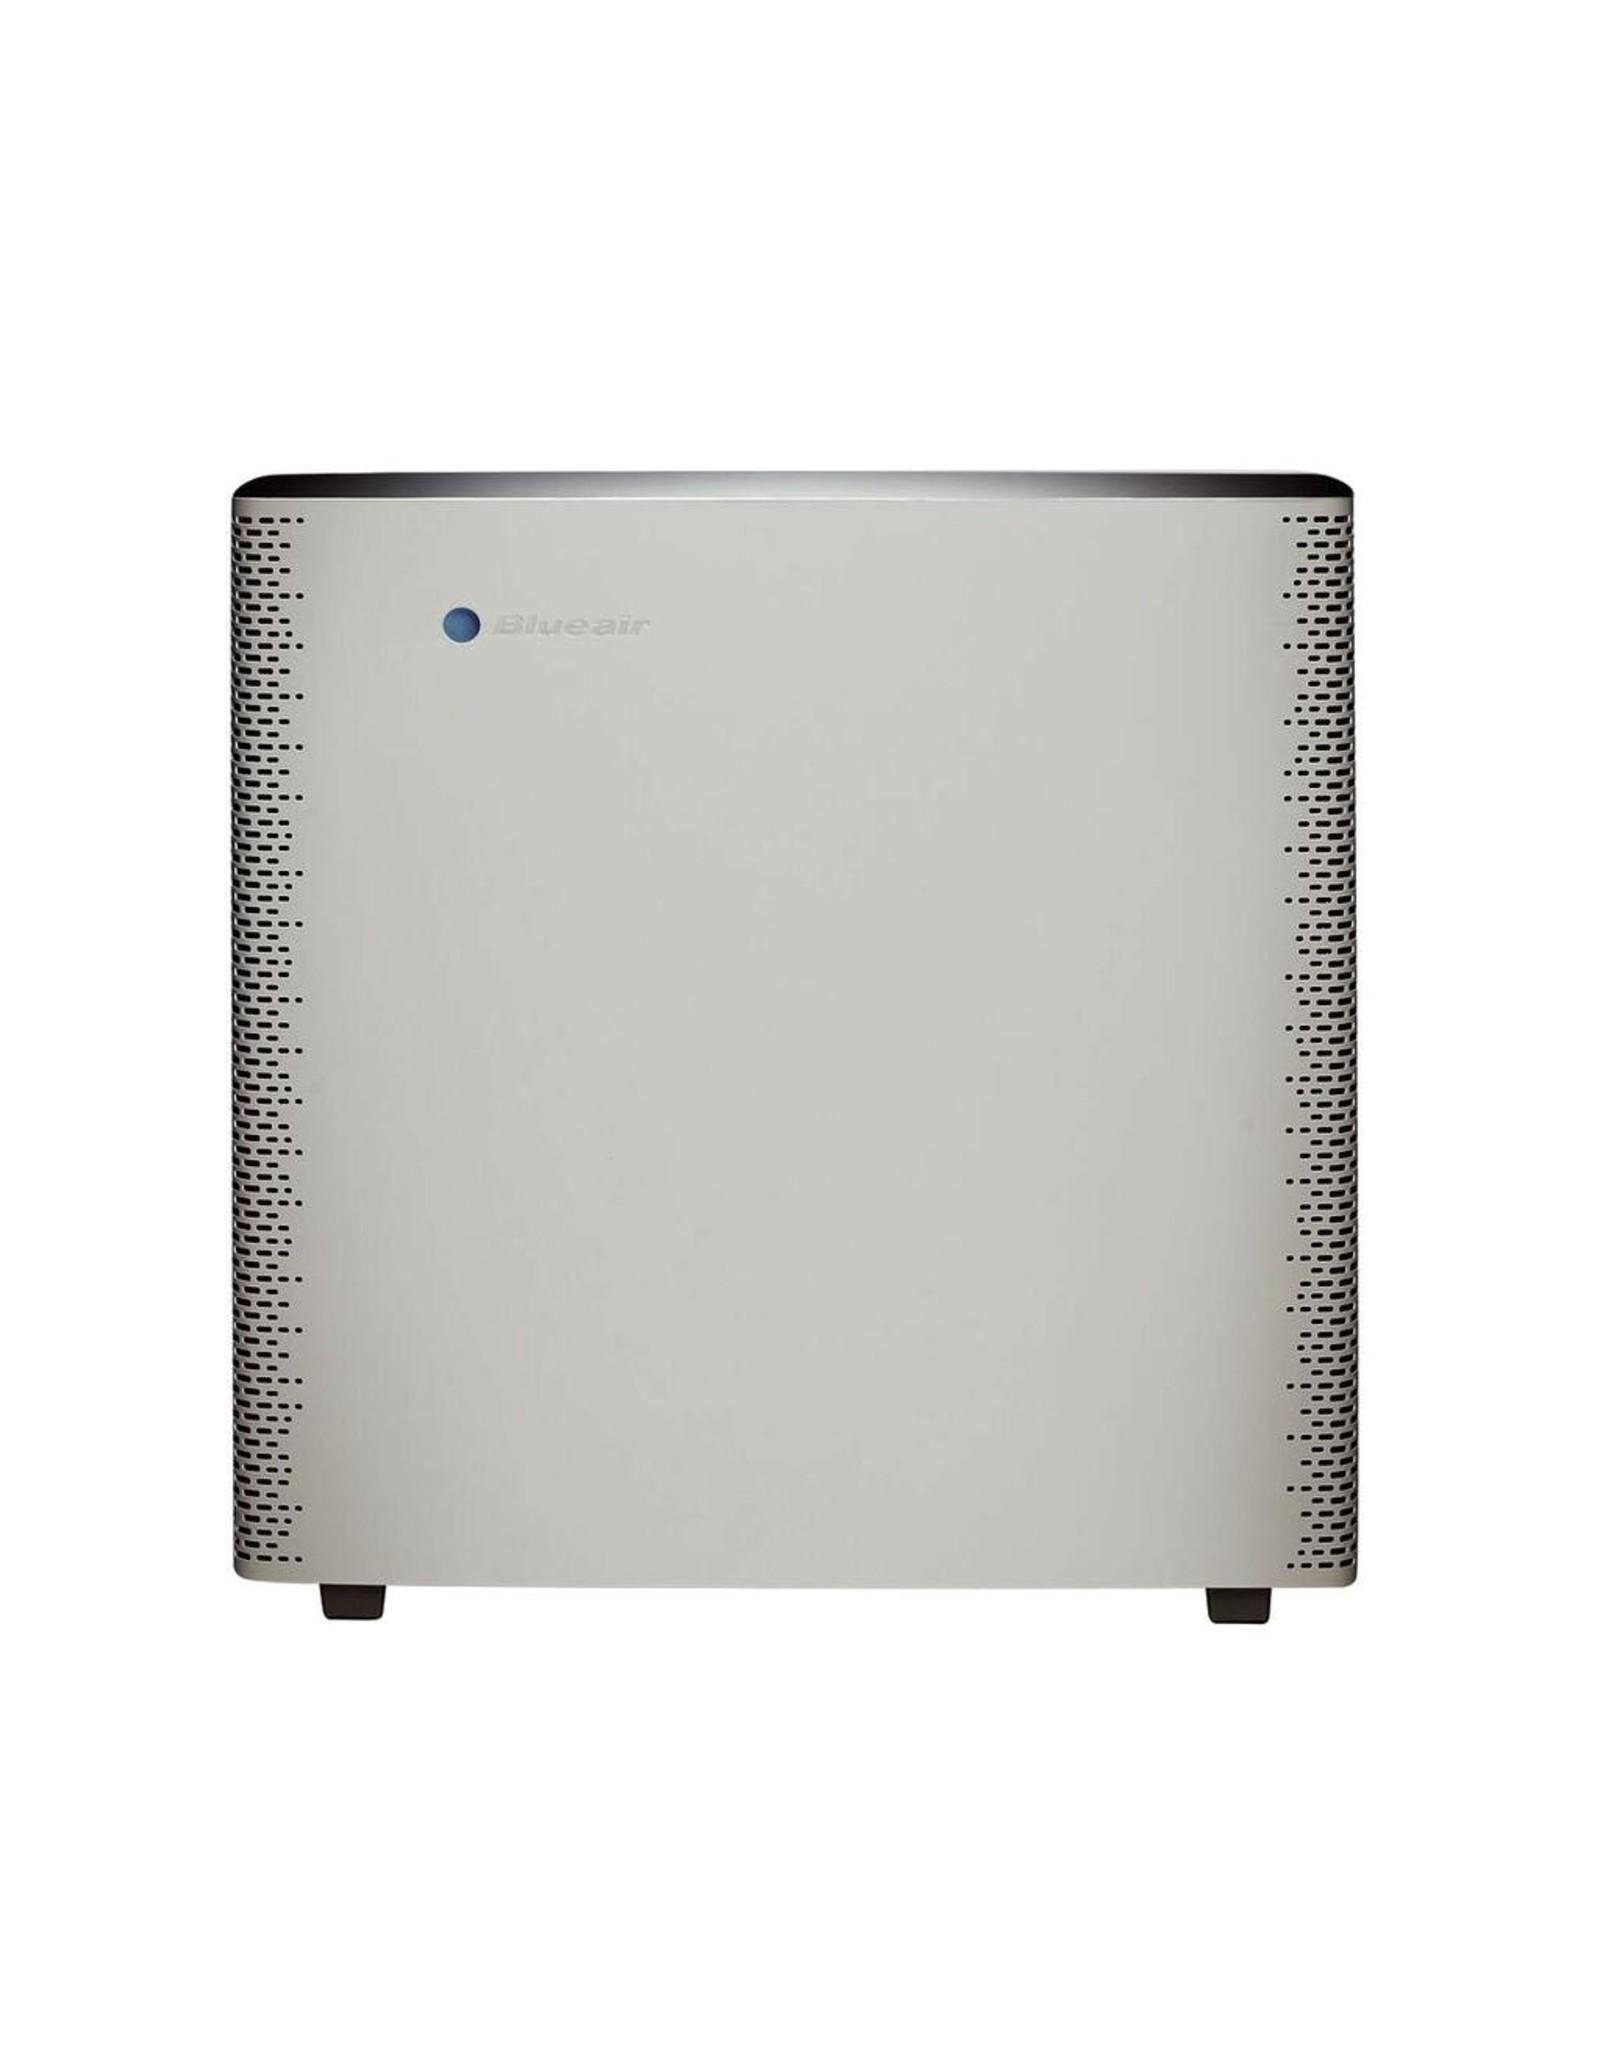 BLUE AIR SENSE+ 智能空氣淨化器